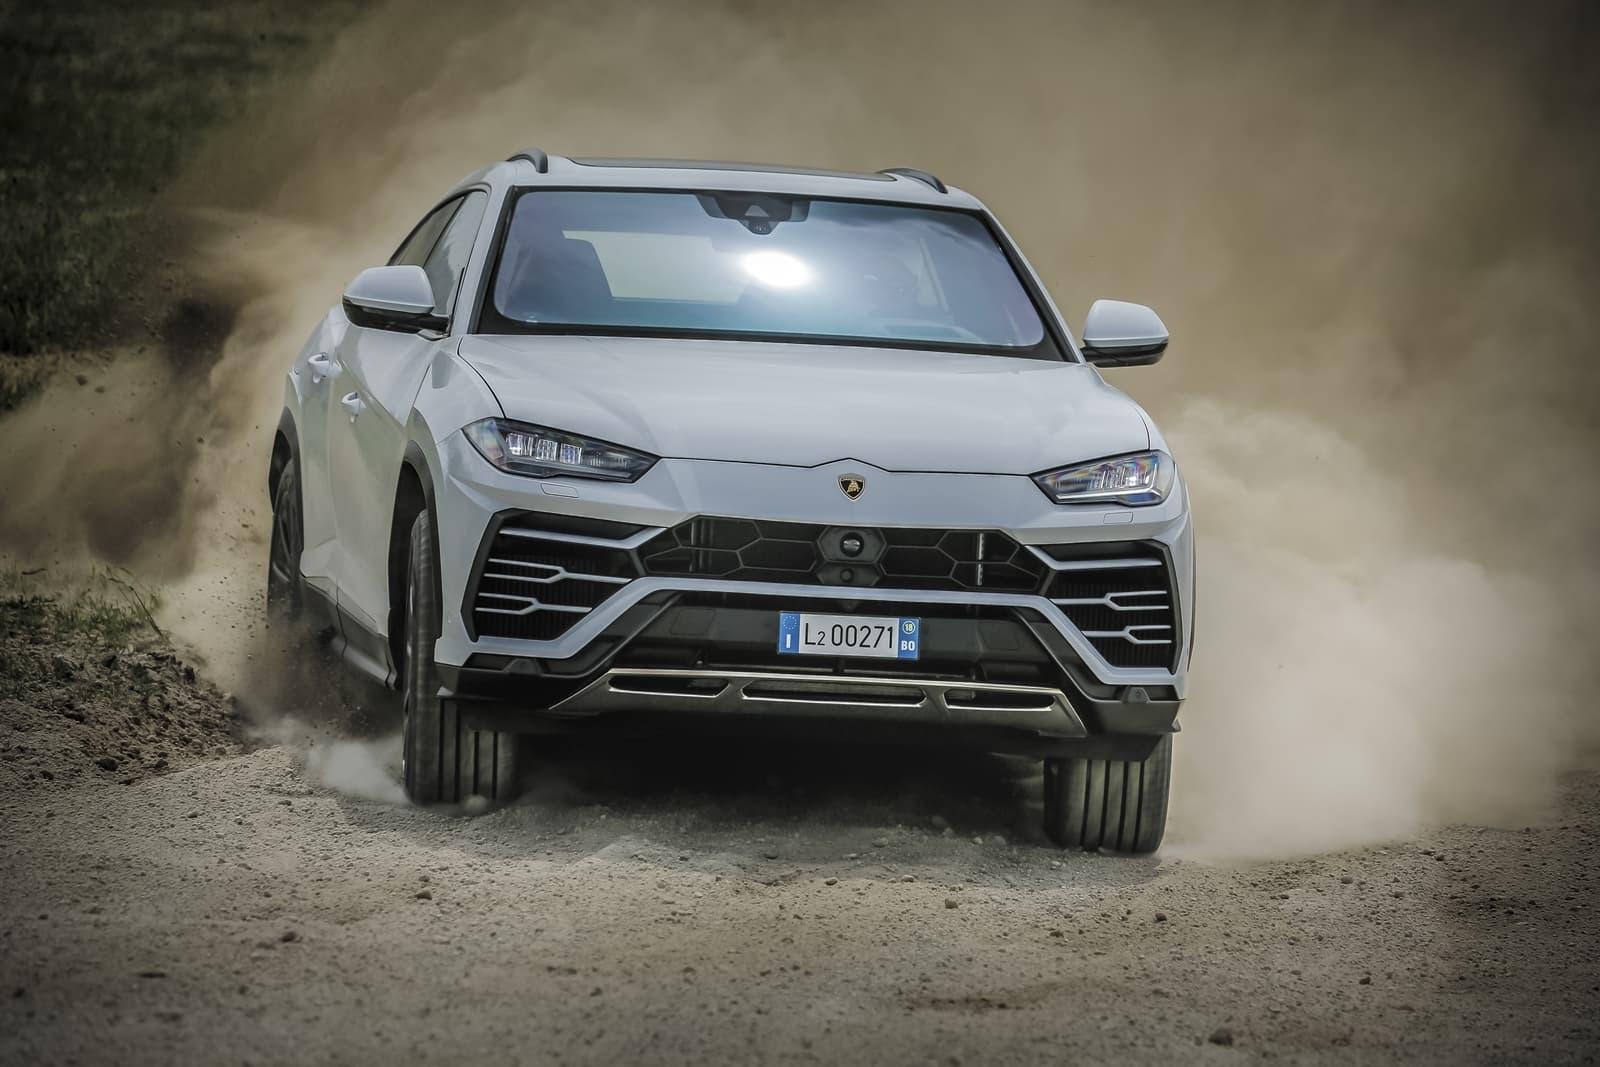 Lamborghini Urus Offroad 0119 006